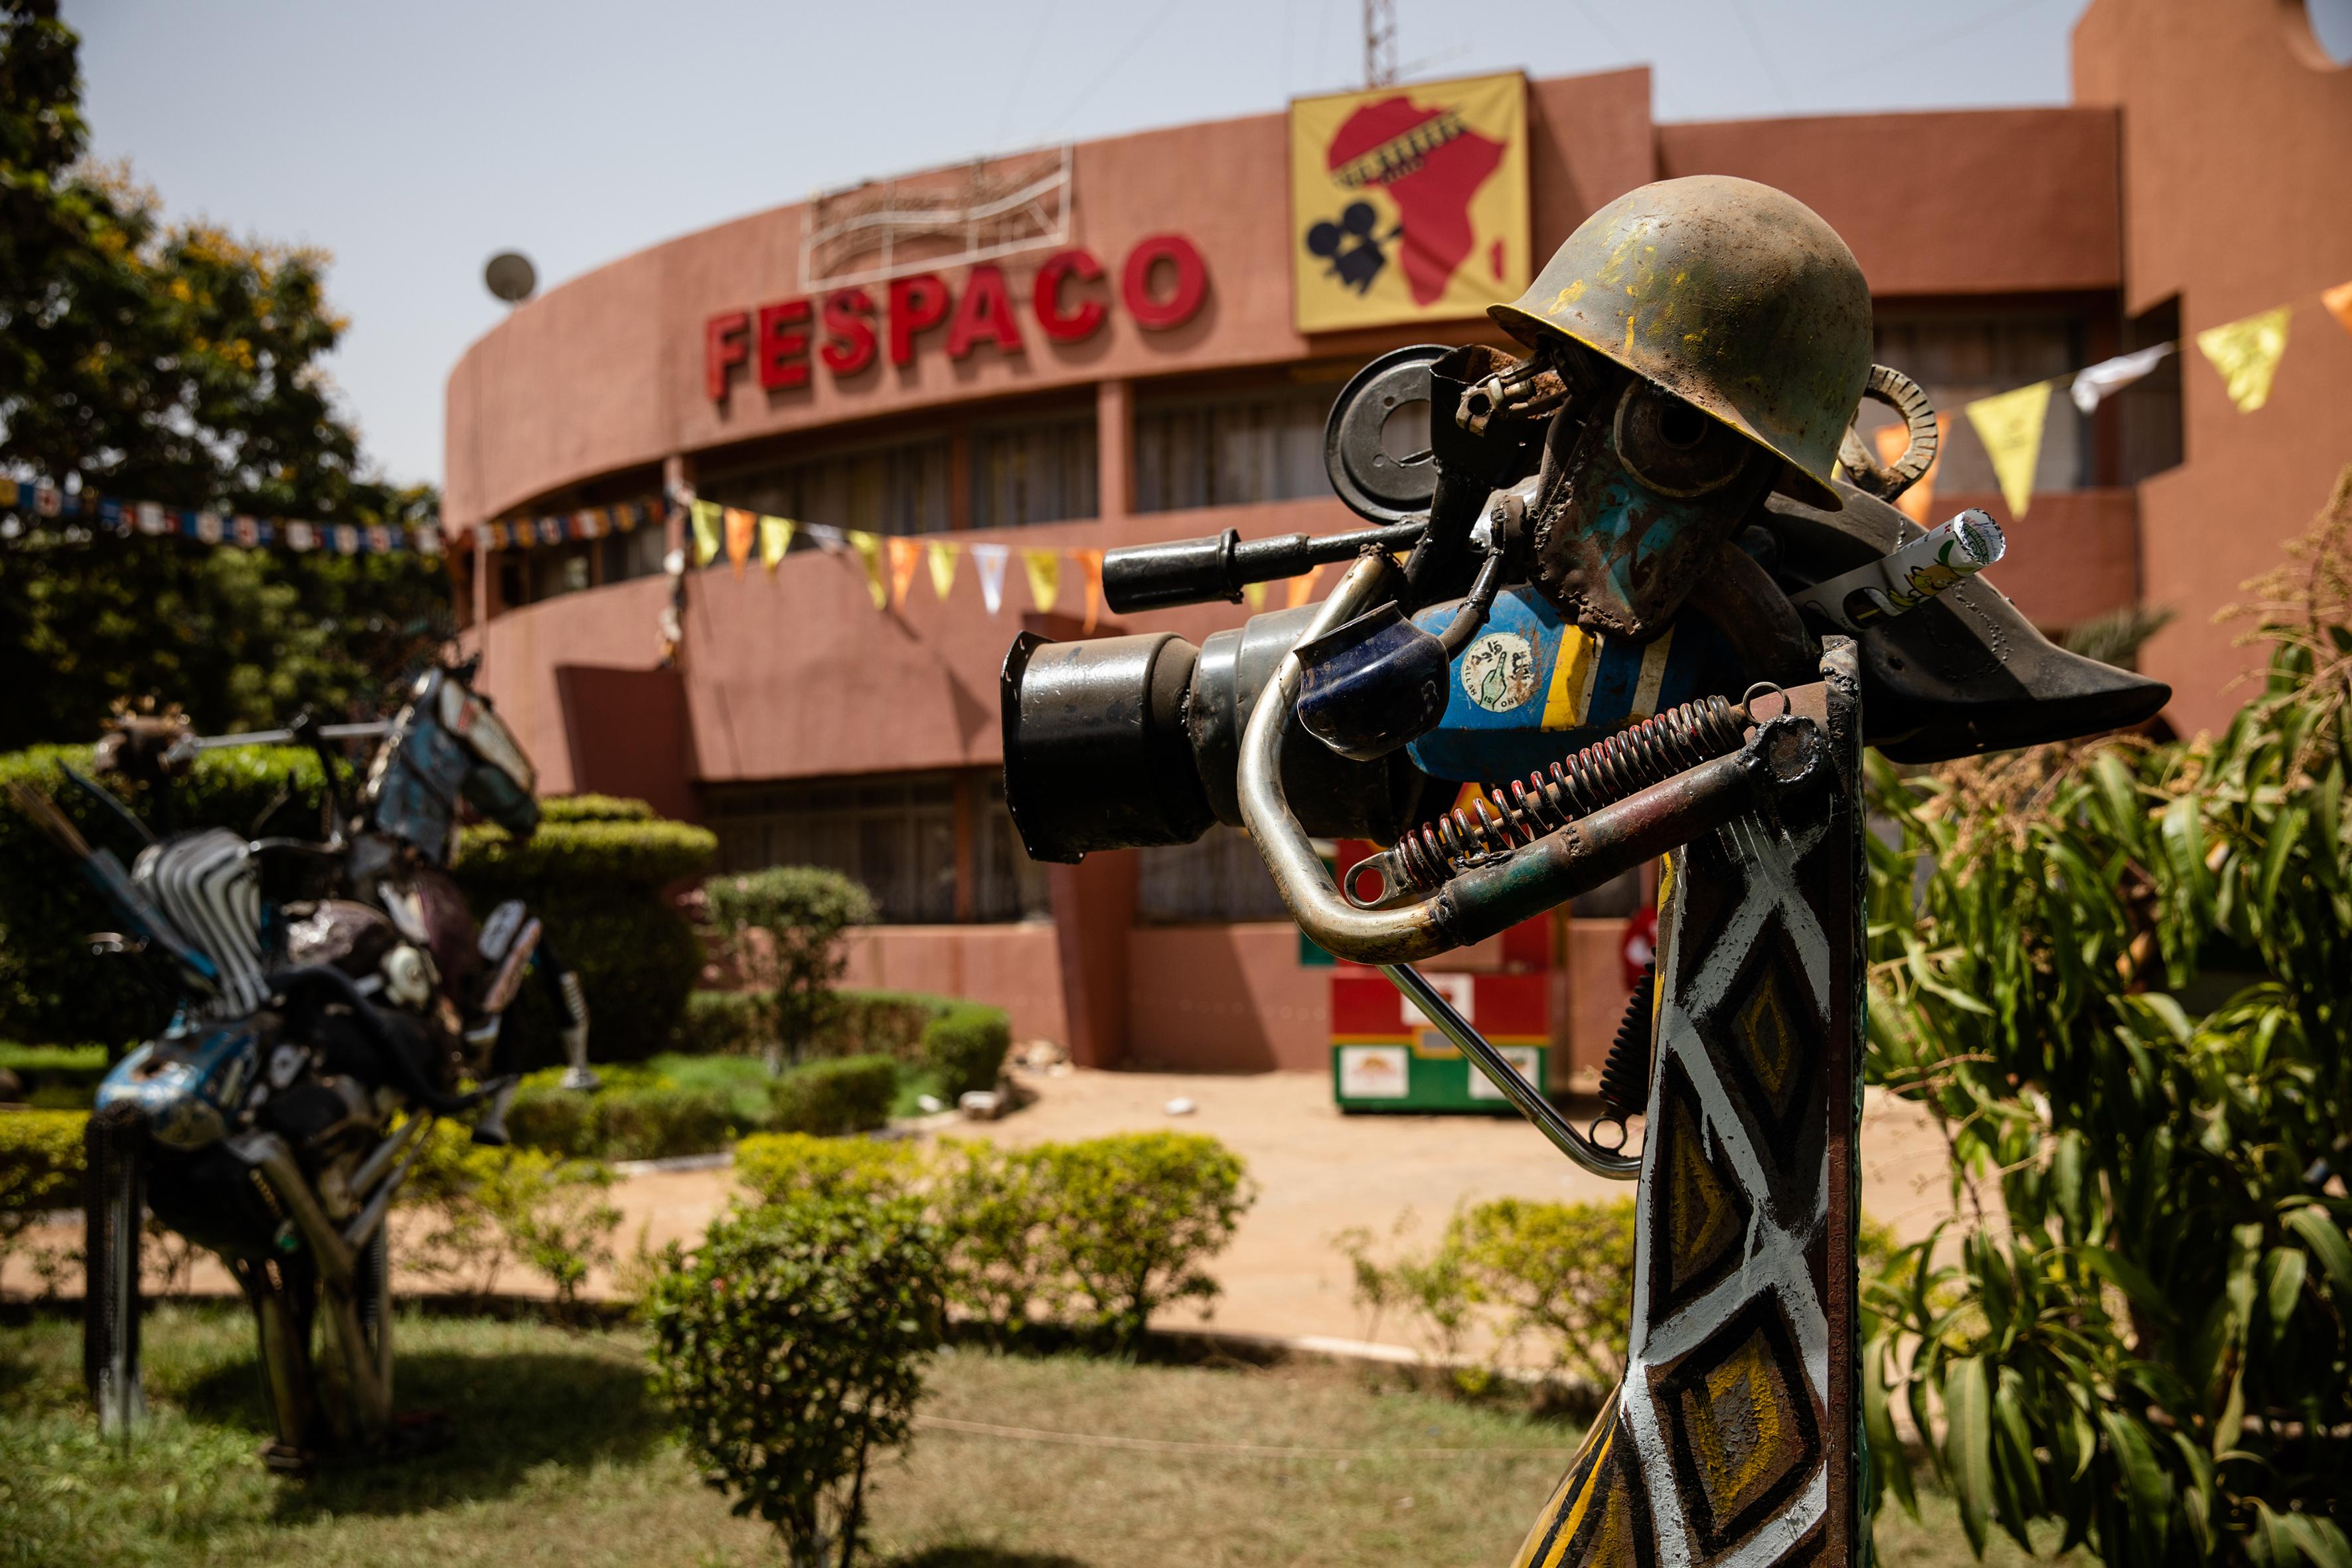 Statue de l'artiste Sahab Koanda devant le siège du Fespaco à Ouagadougou.